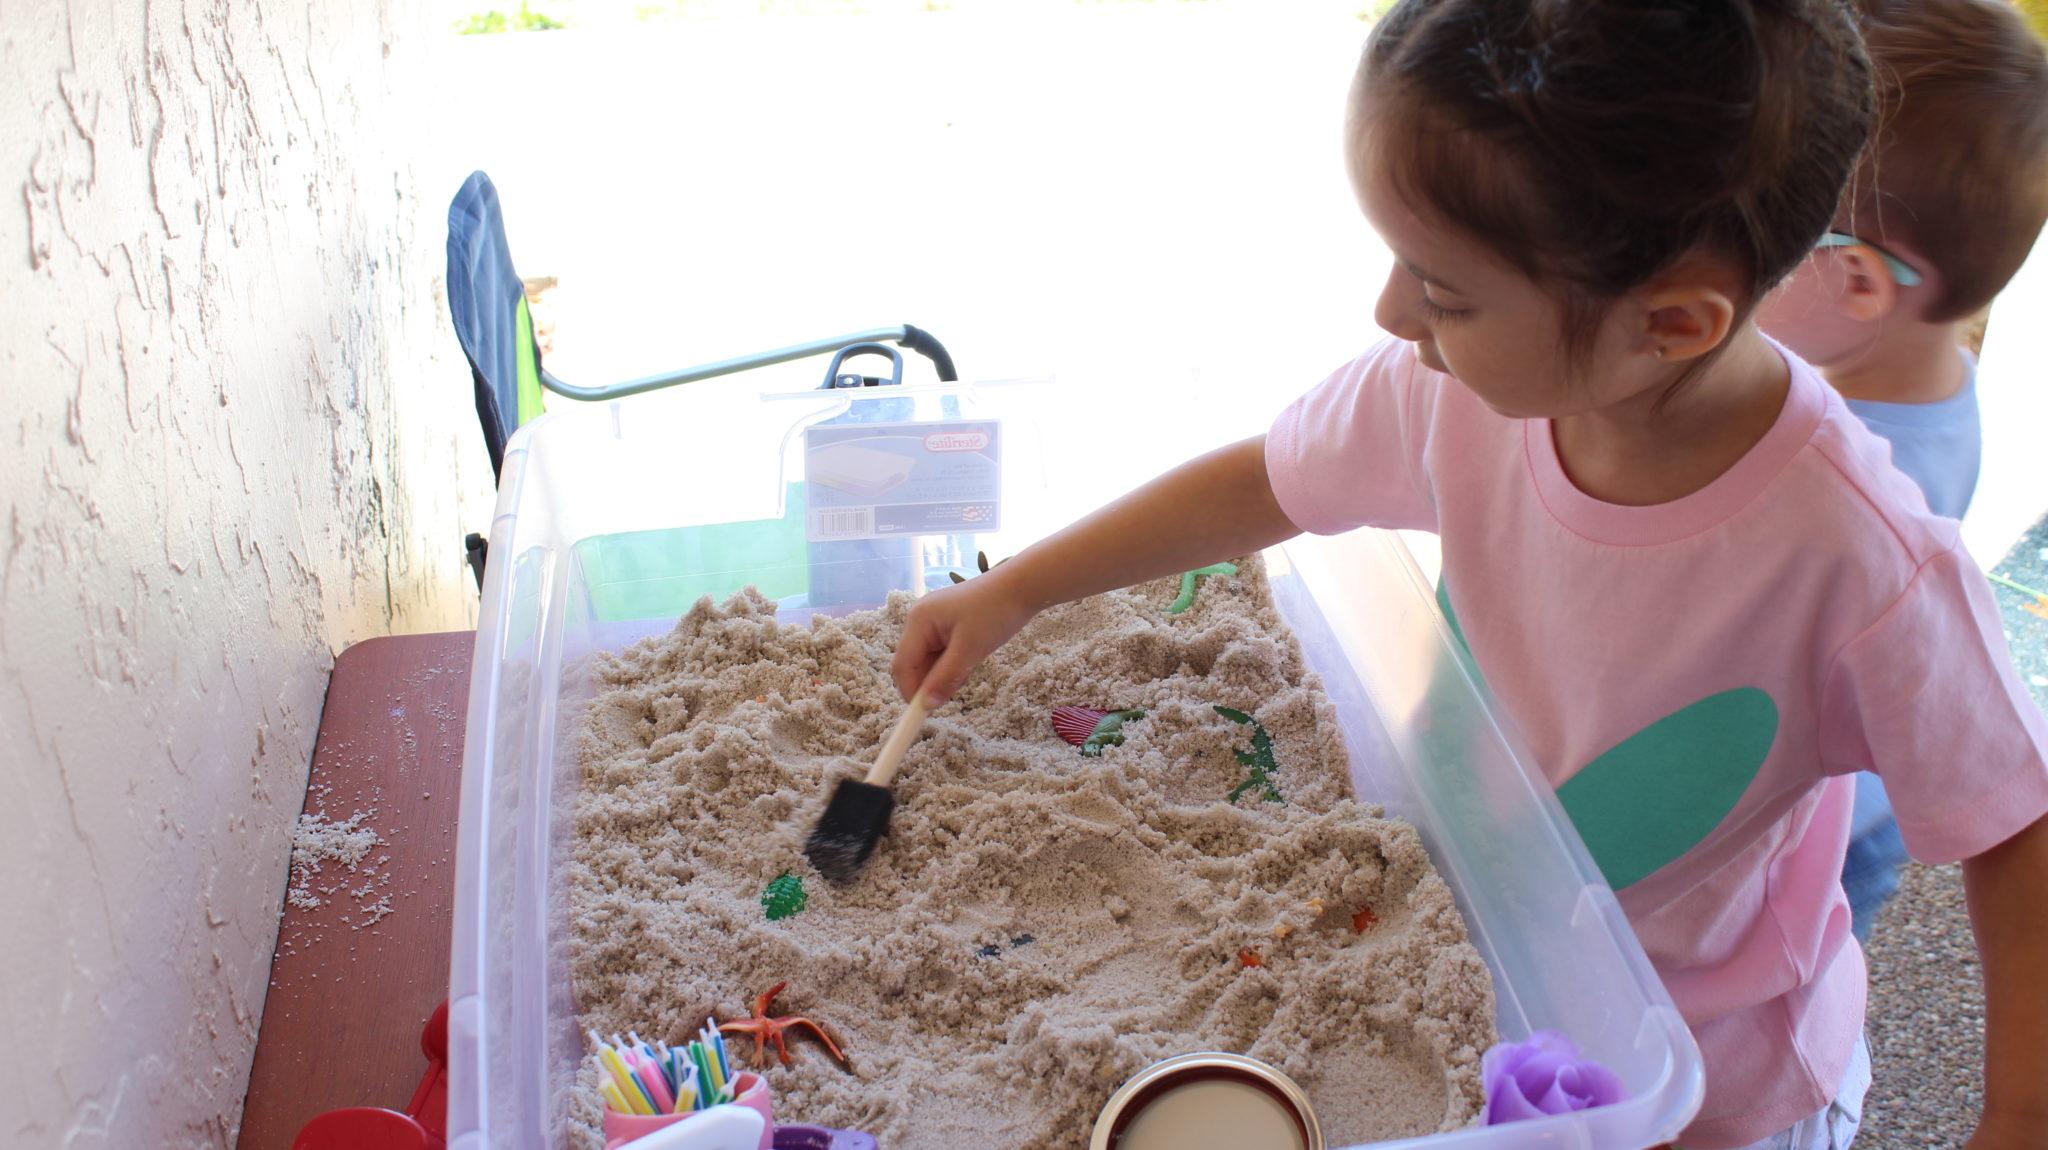 Dinosaur Excavation Sensory Bin for Toddlers